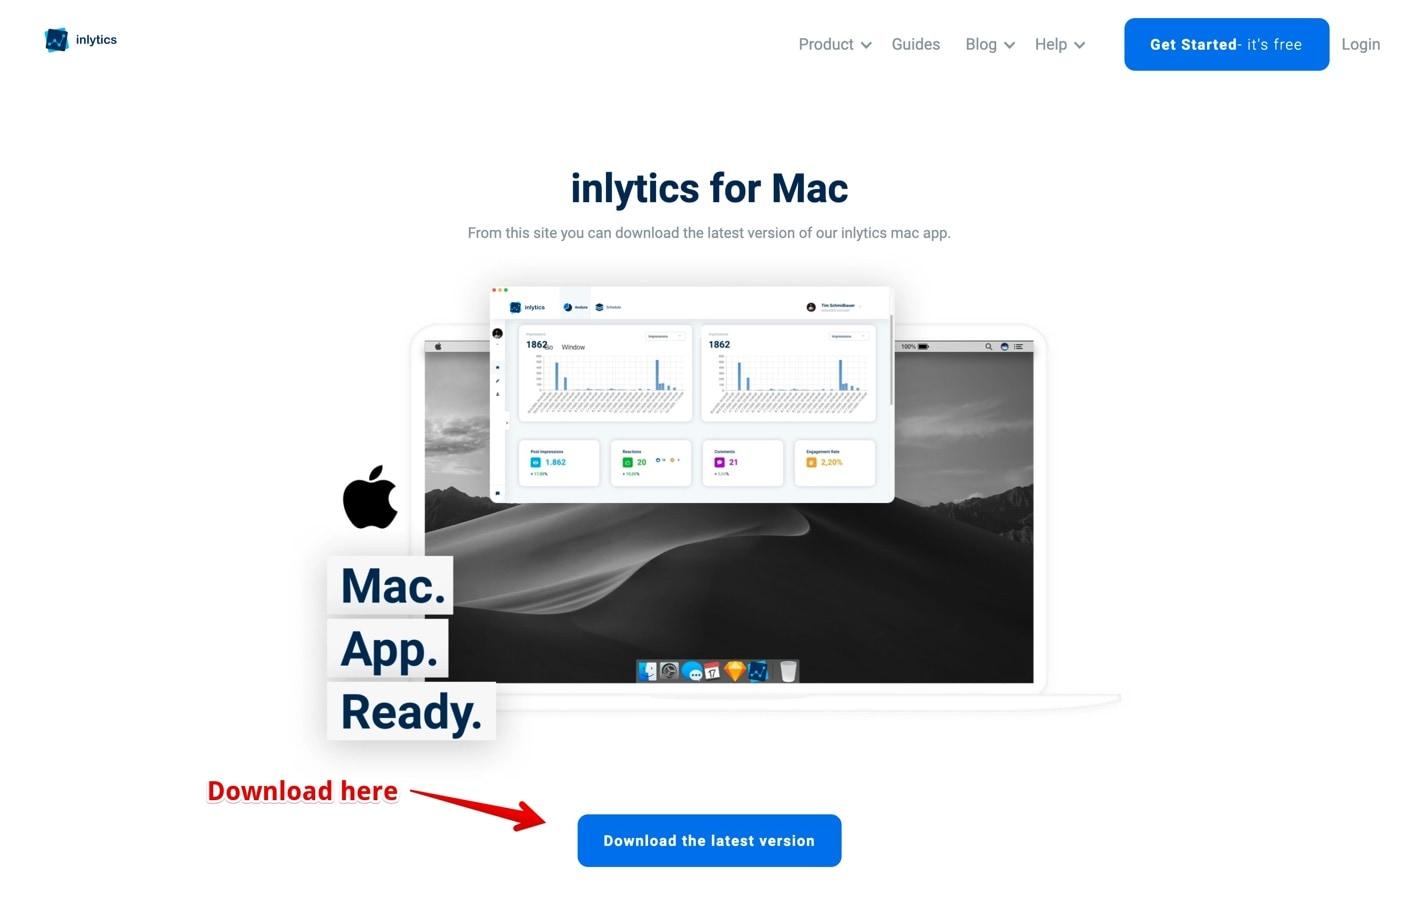 download the inlytics mac app